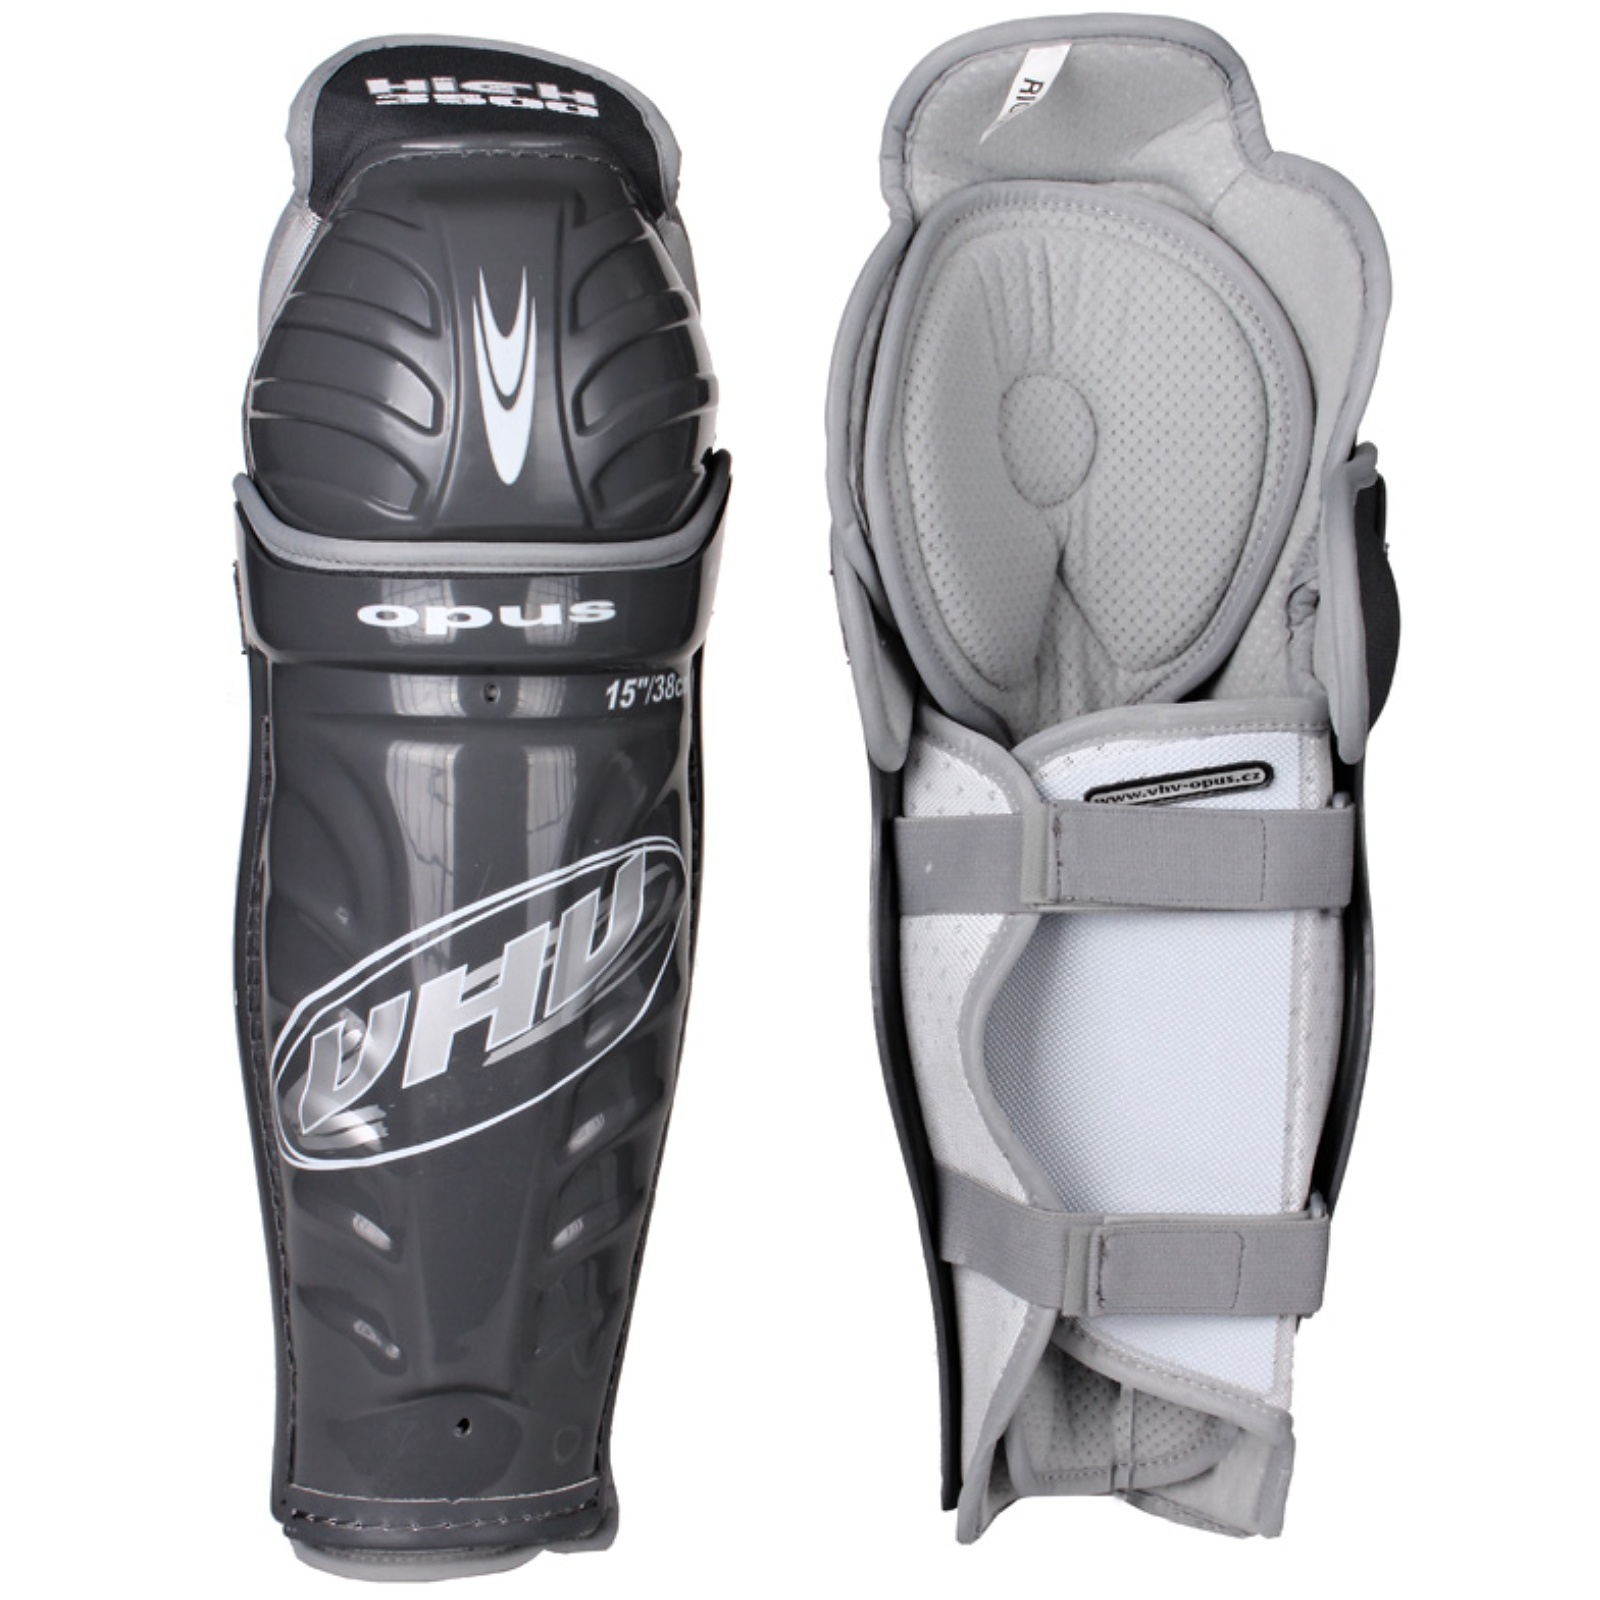 Hokejový chránič holení OPUS 3694 High 3500 SR - vel. 16''